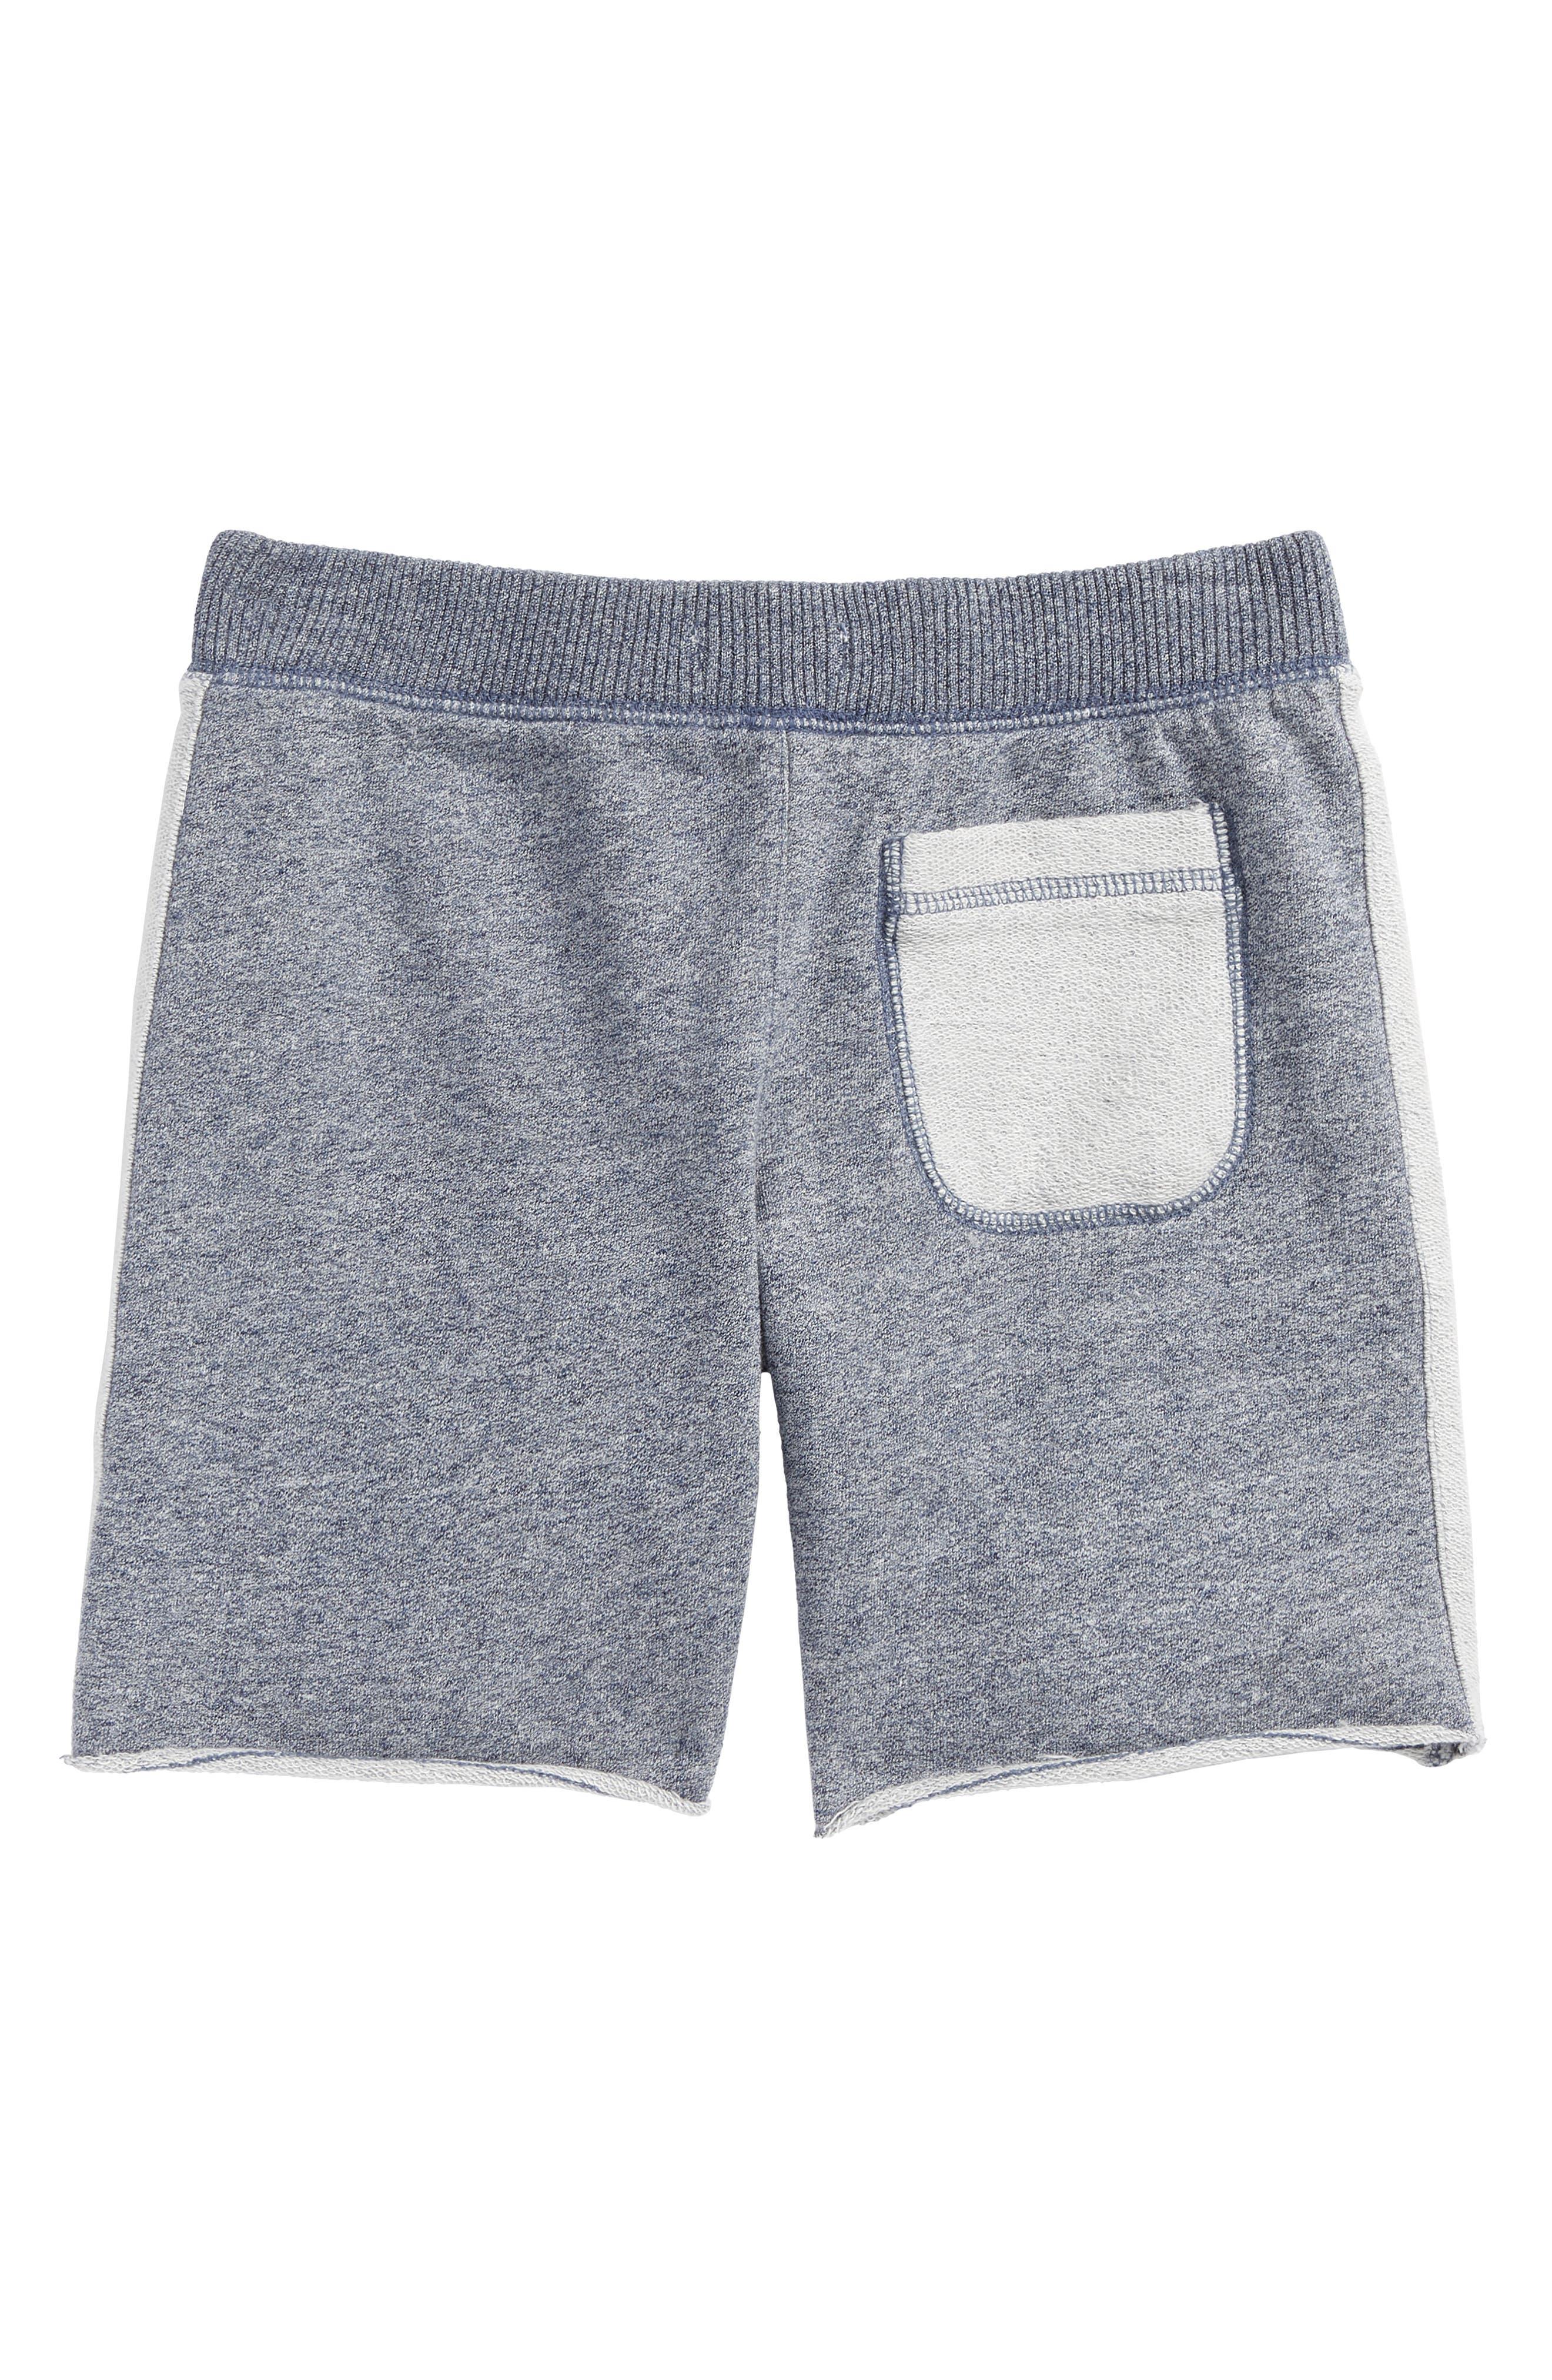 Fleece Shorts,                             Alternate thumbnail 2, color,                             Navy Denim